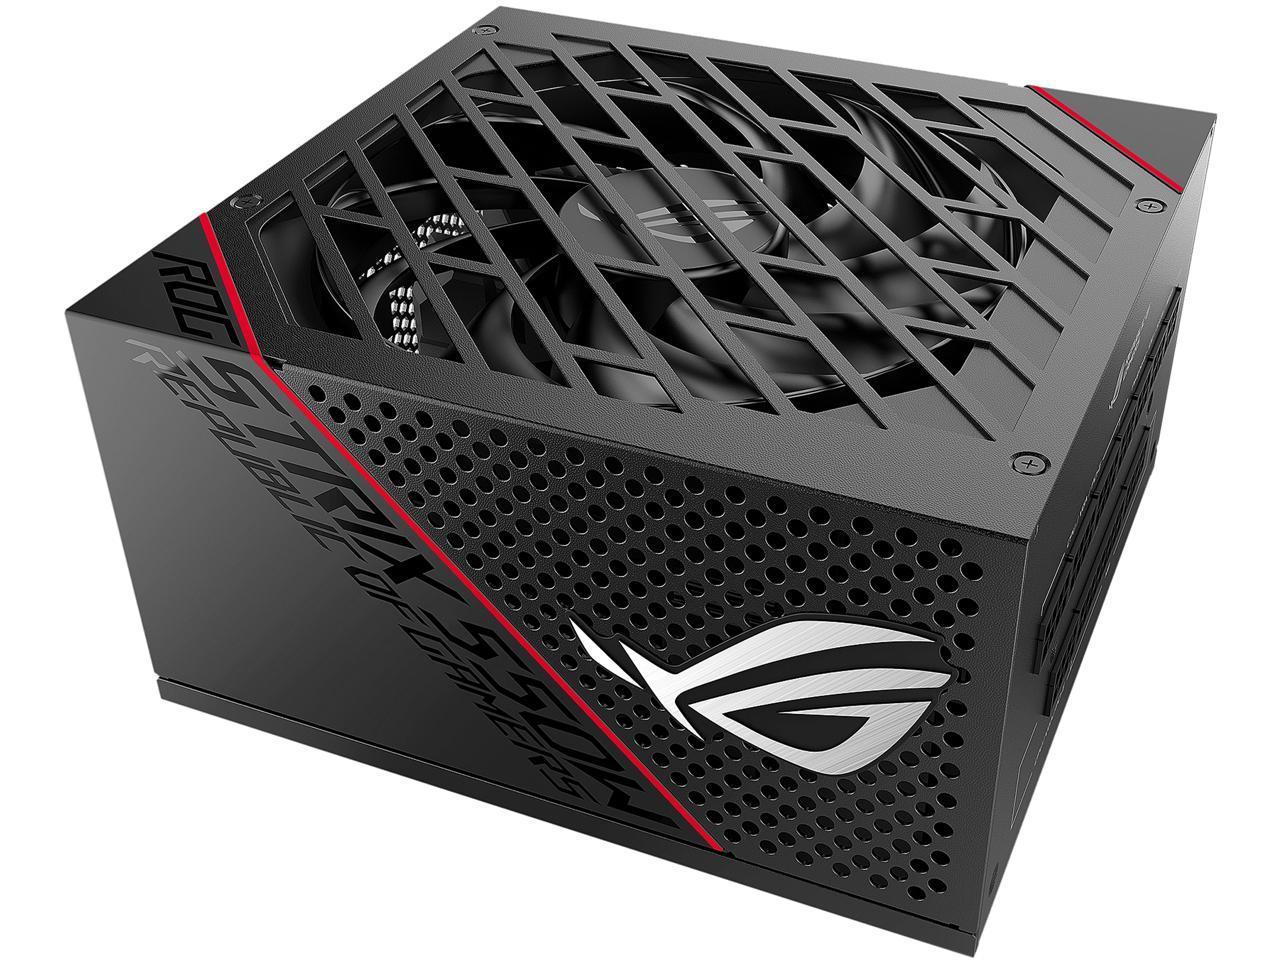 Asus - Rog Strix Gold 550G Power Supply Unit